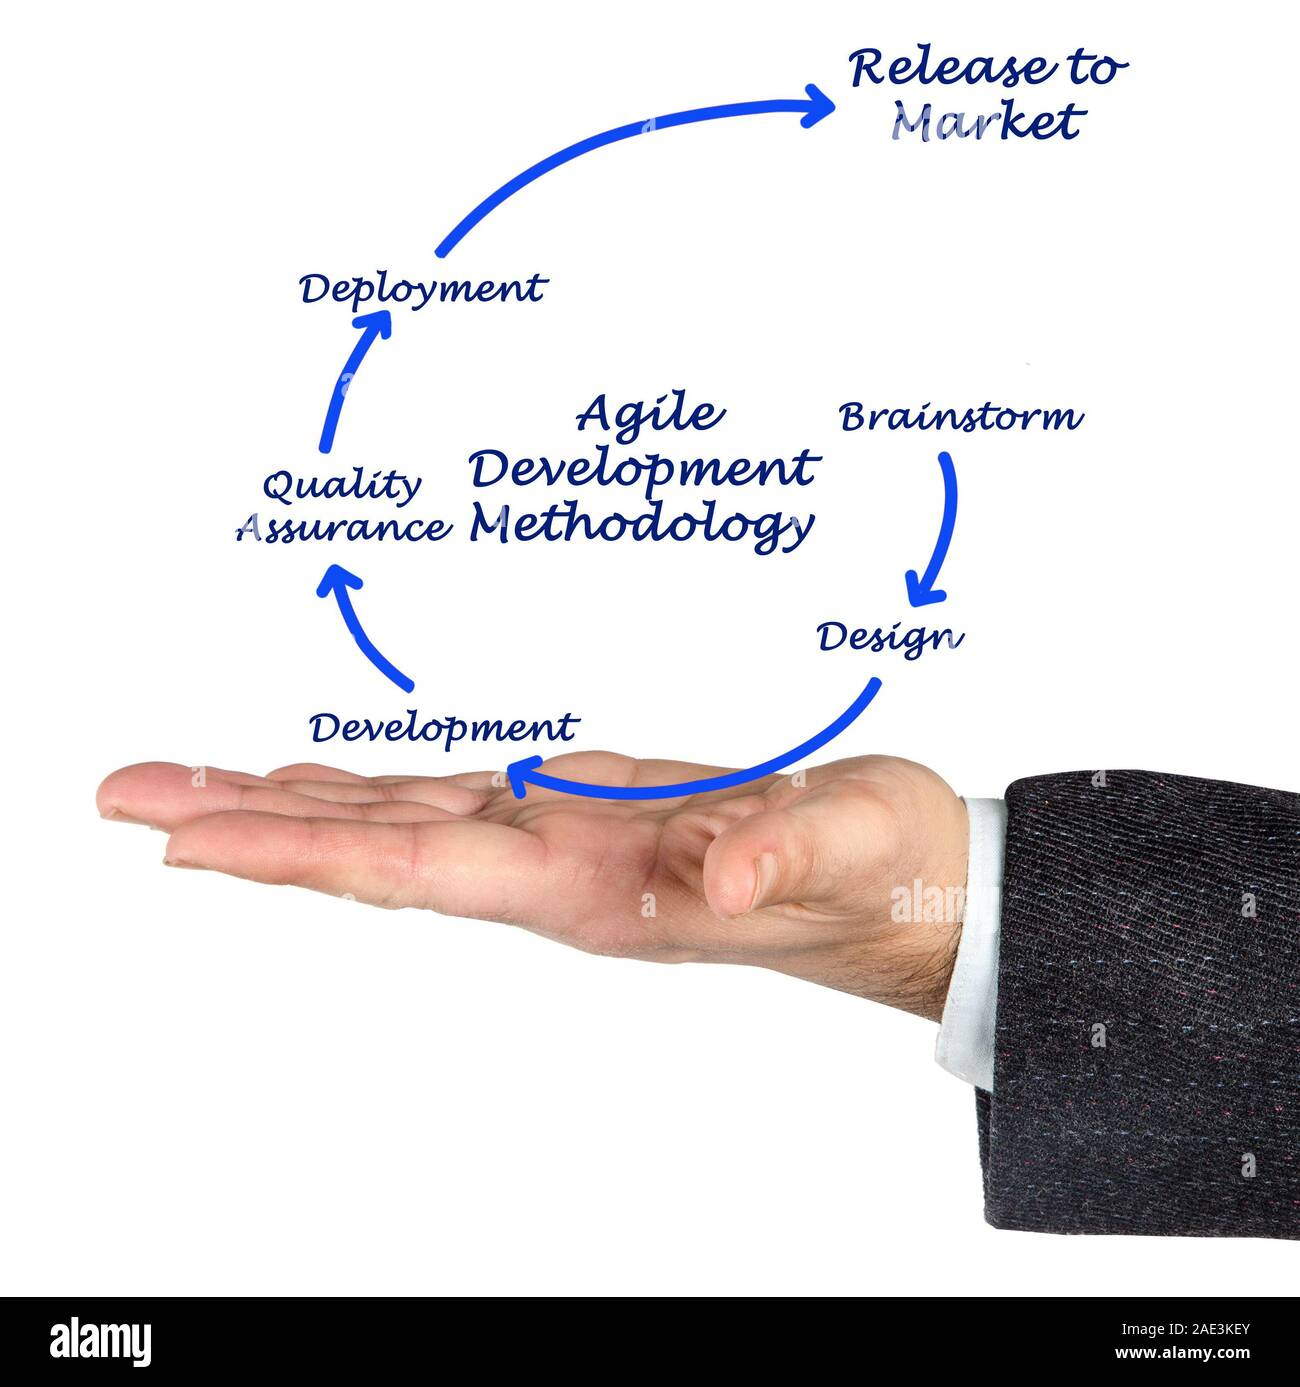 Agile Development Methodology Stock Photo